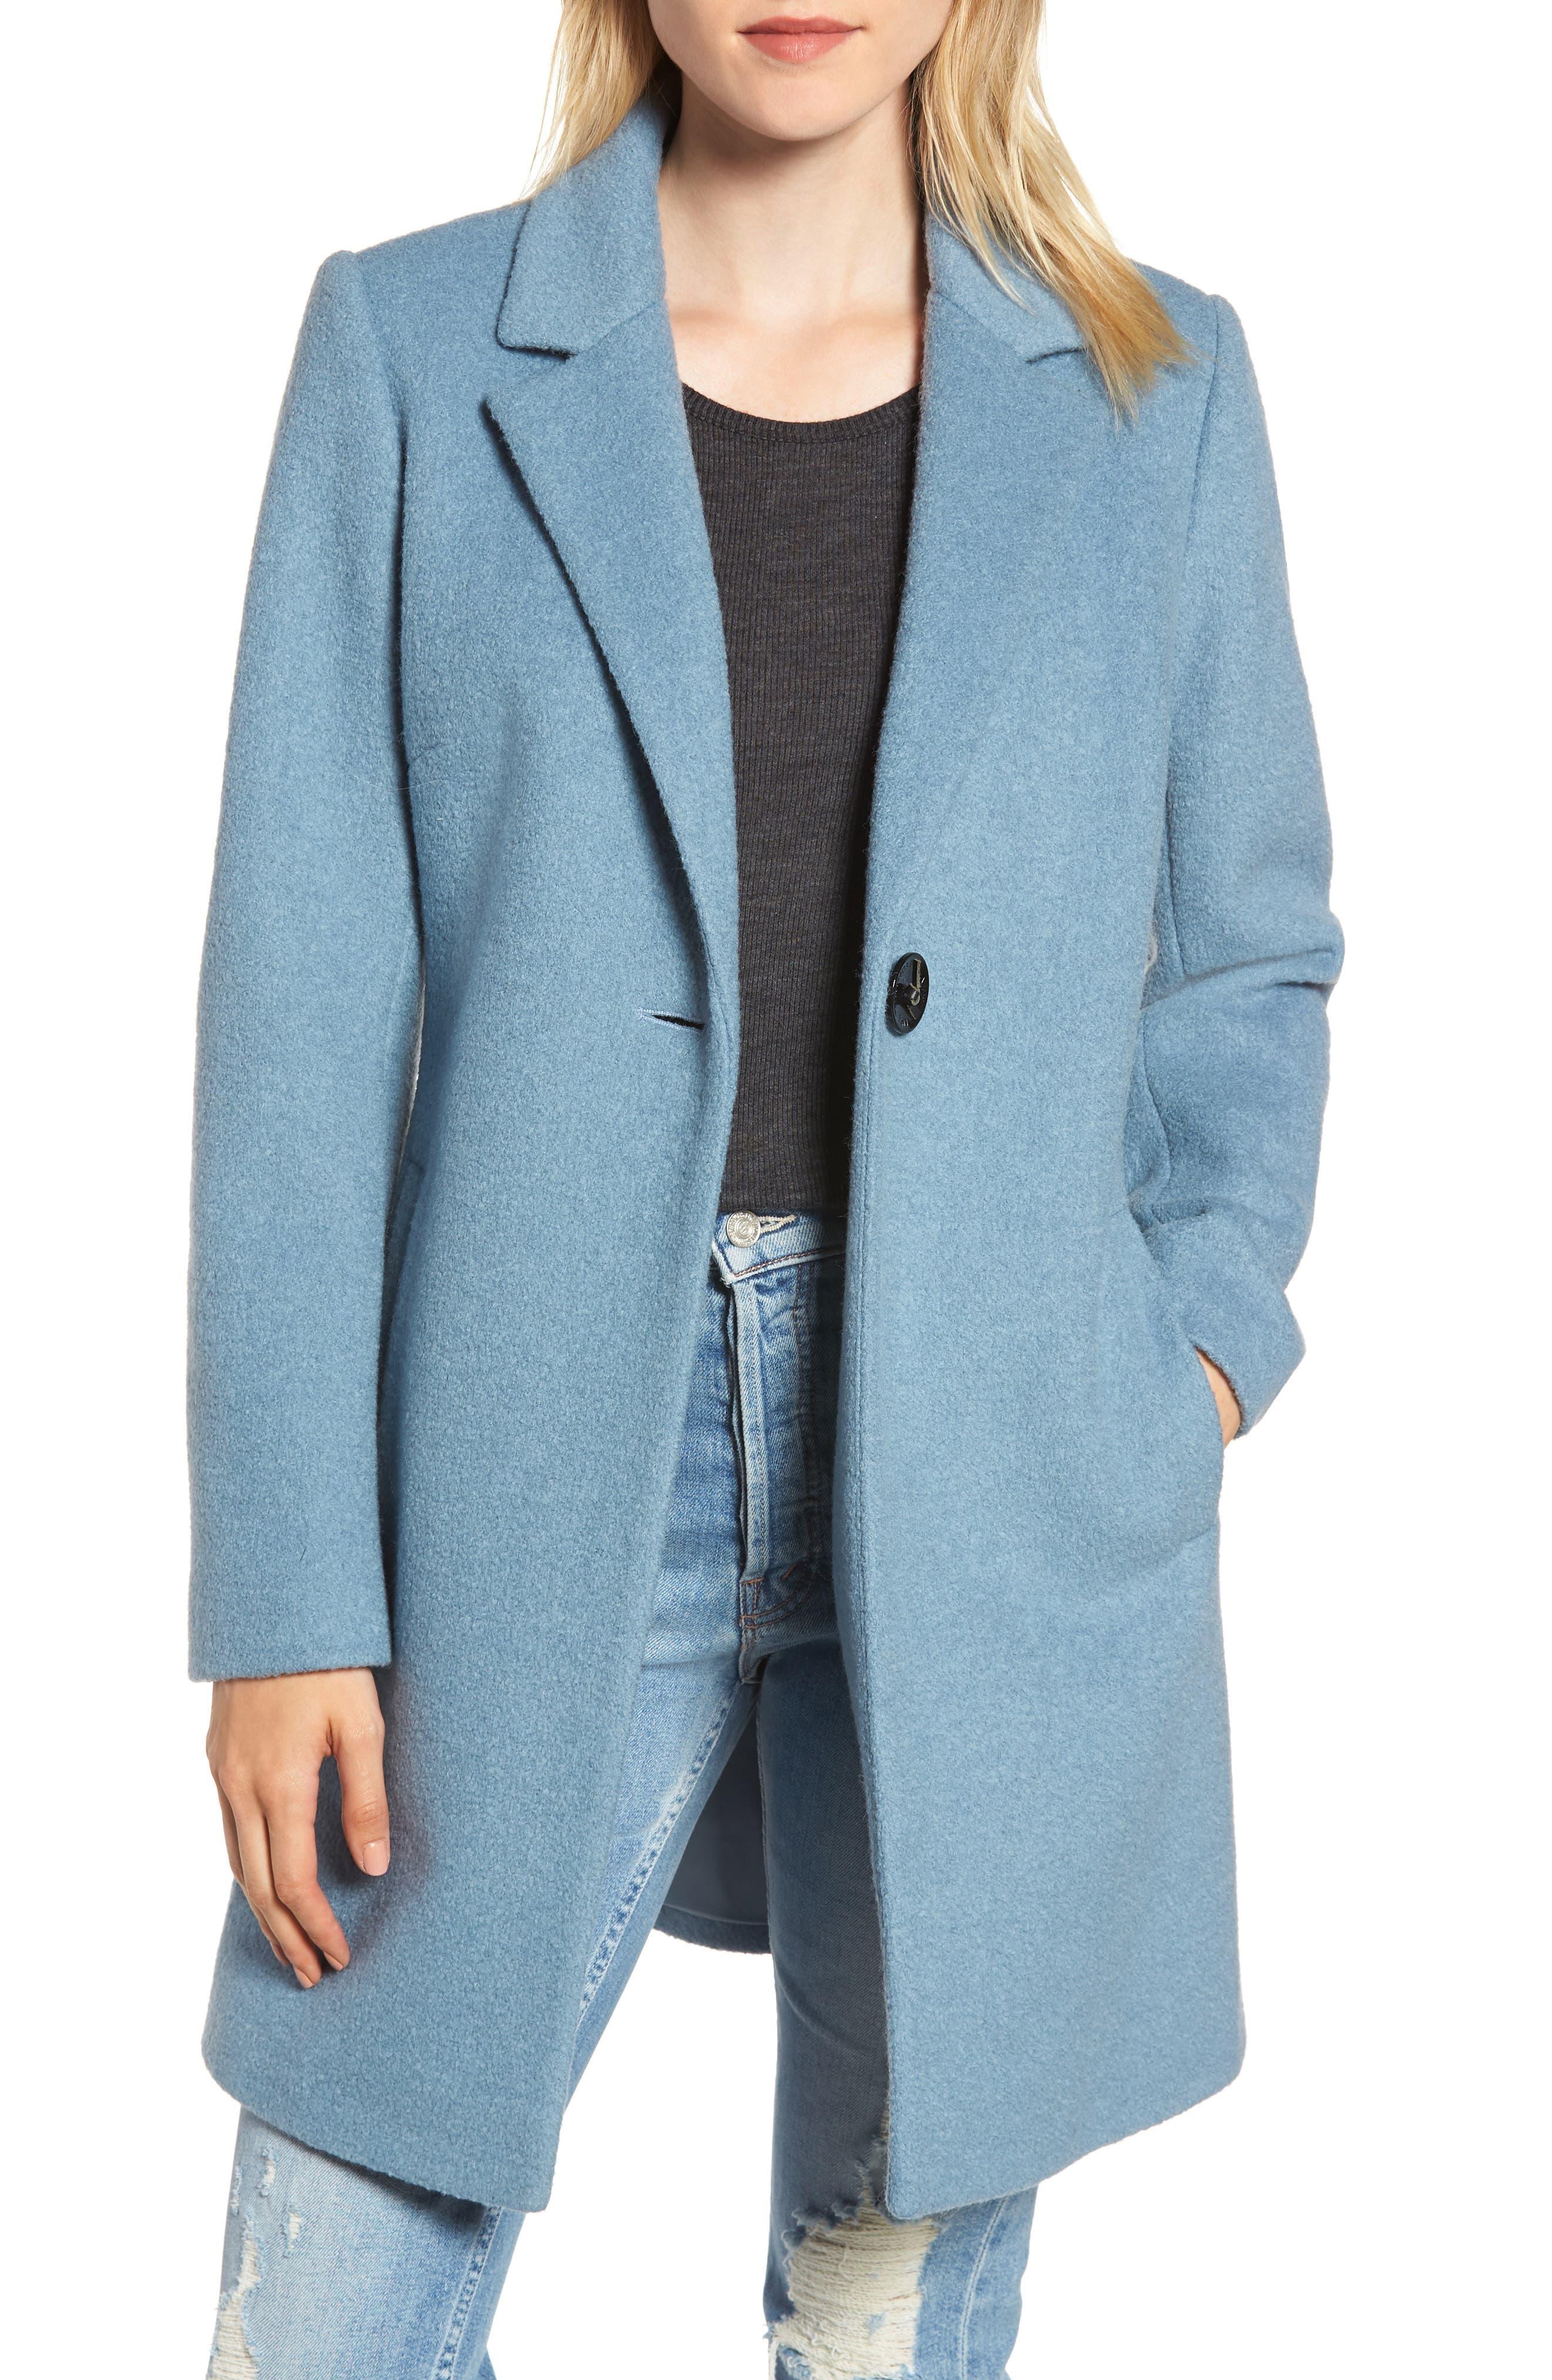 Blazer Jacket,                             Main thumbnail 1, color,                             LIGHT BLUE